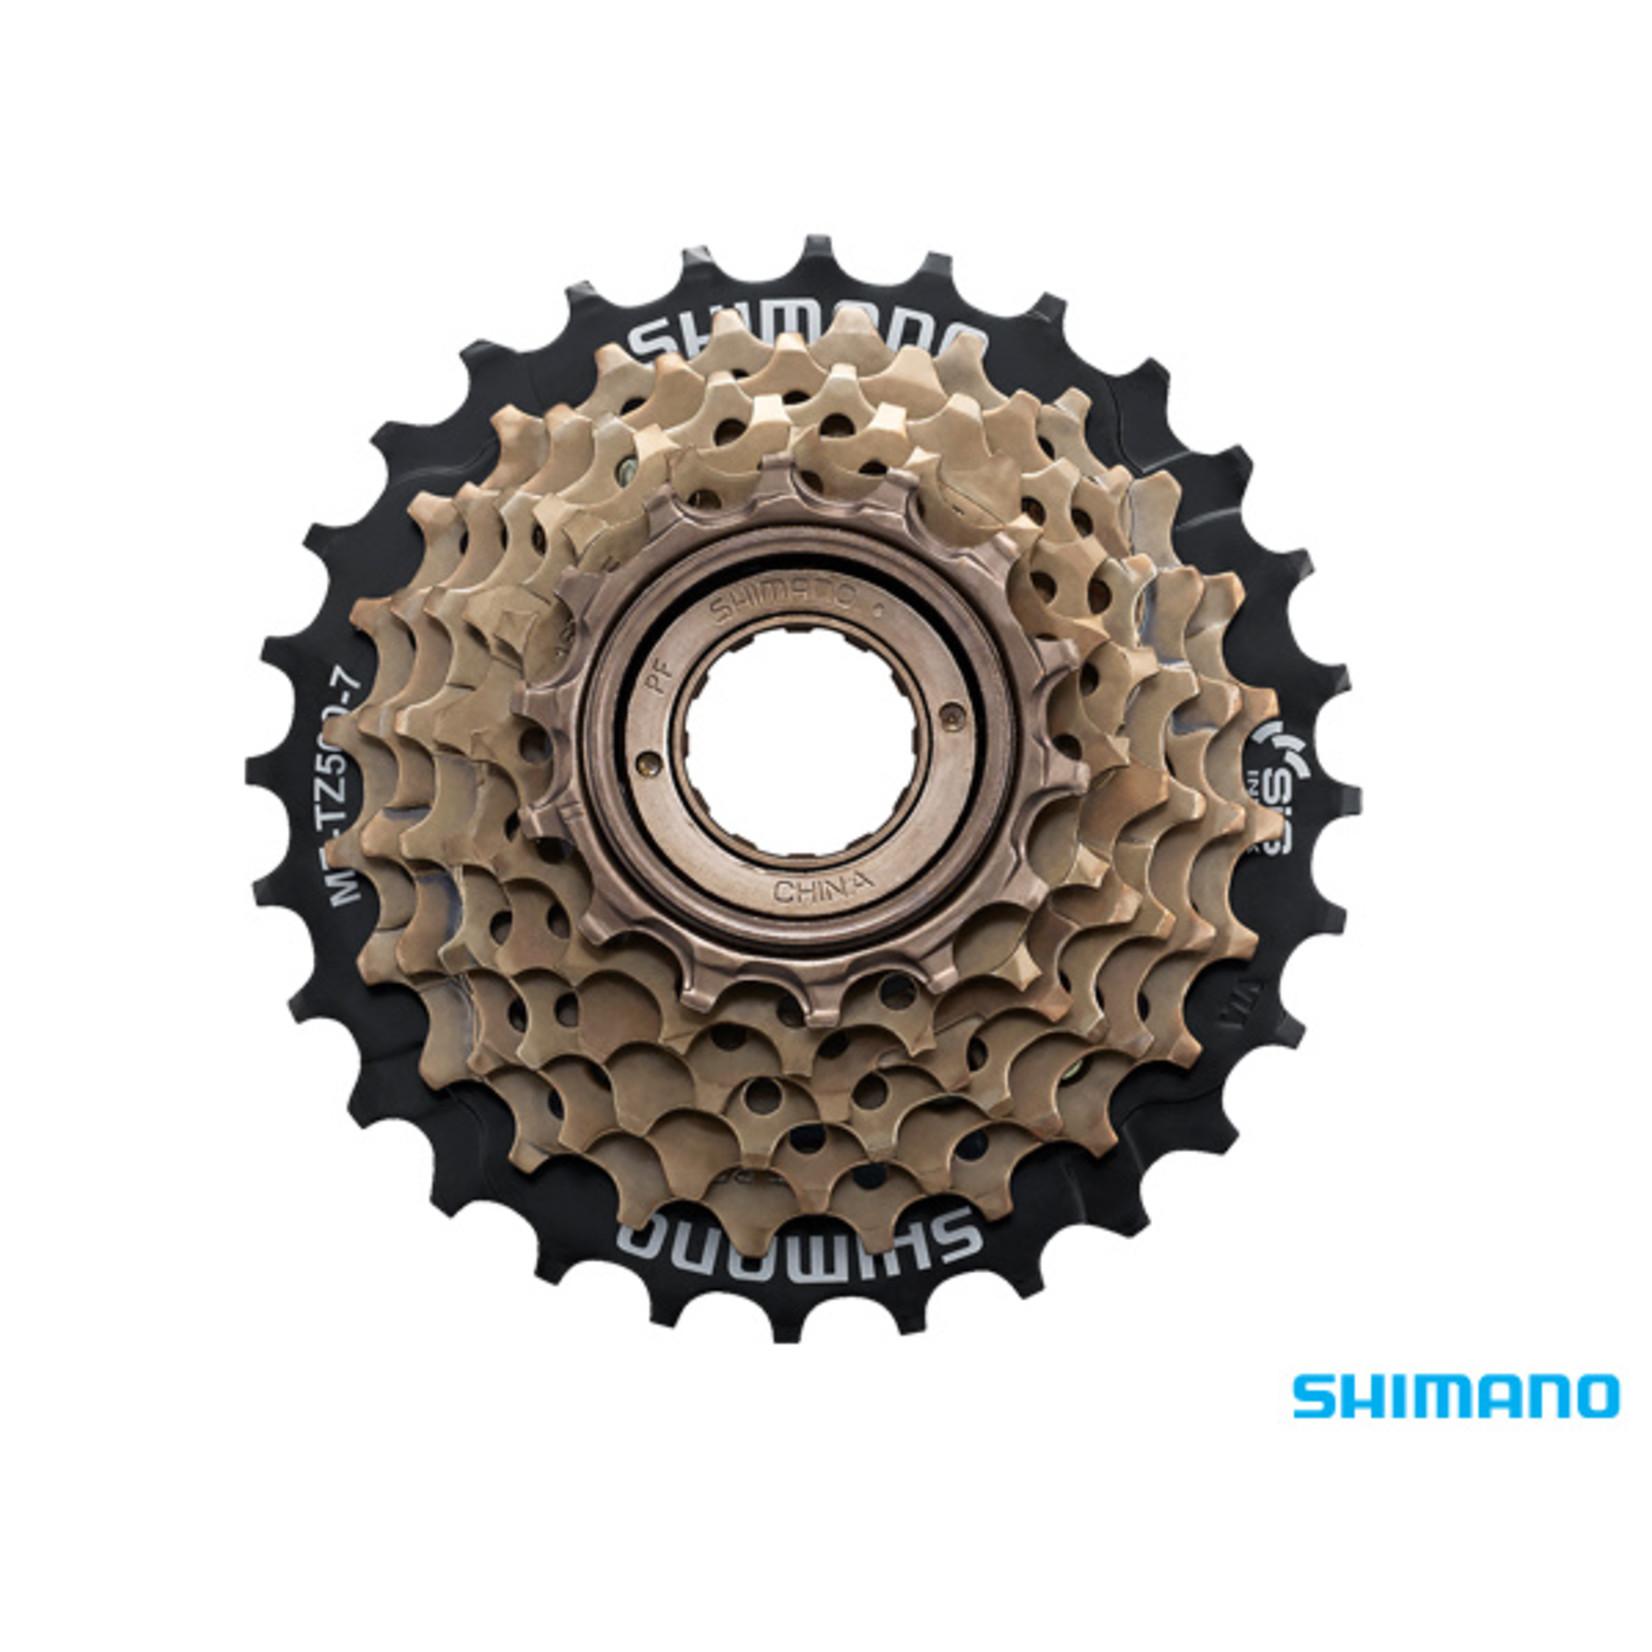 Shimano Shimano, MF-TZ500 Freewheel 7 Speed